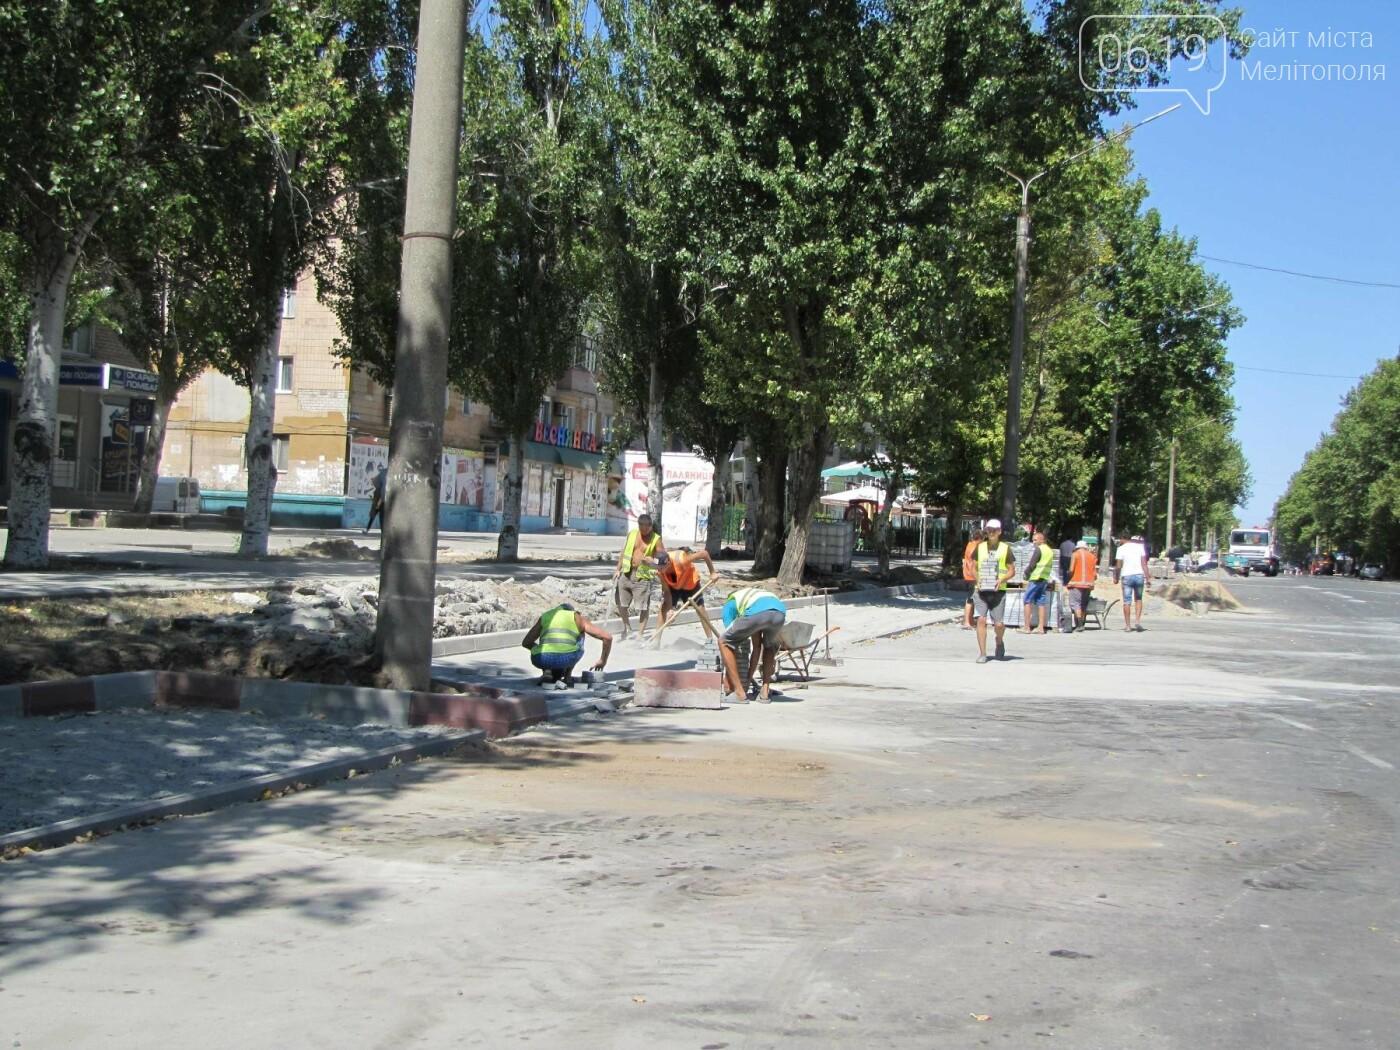 В Мелитополе отремонтируют проспект до Дня города , фото-5